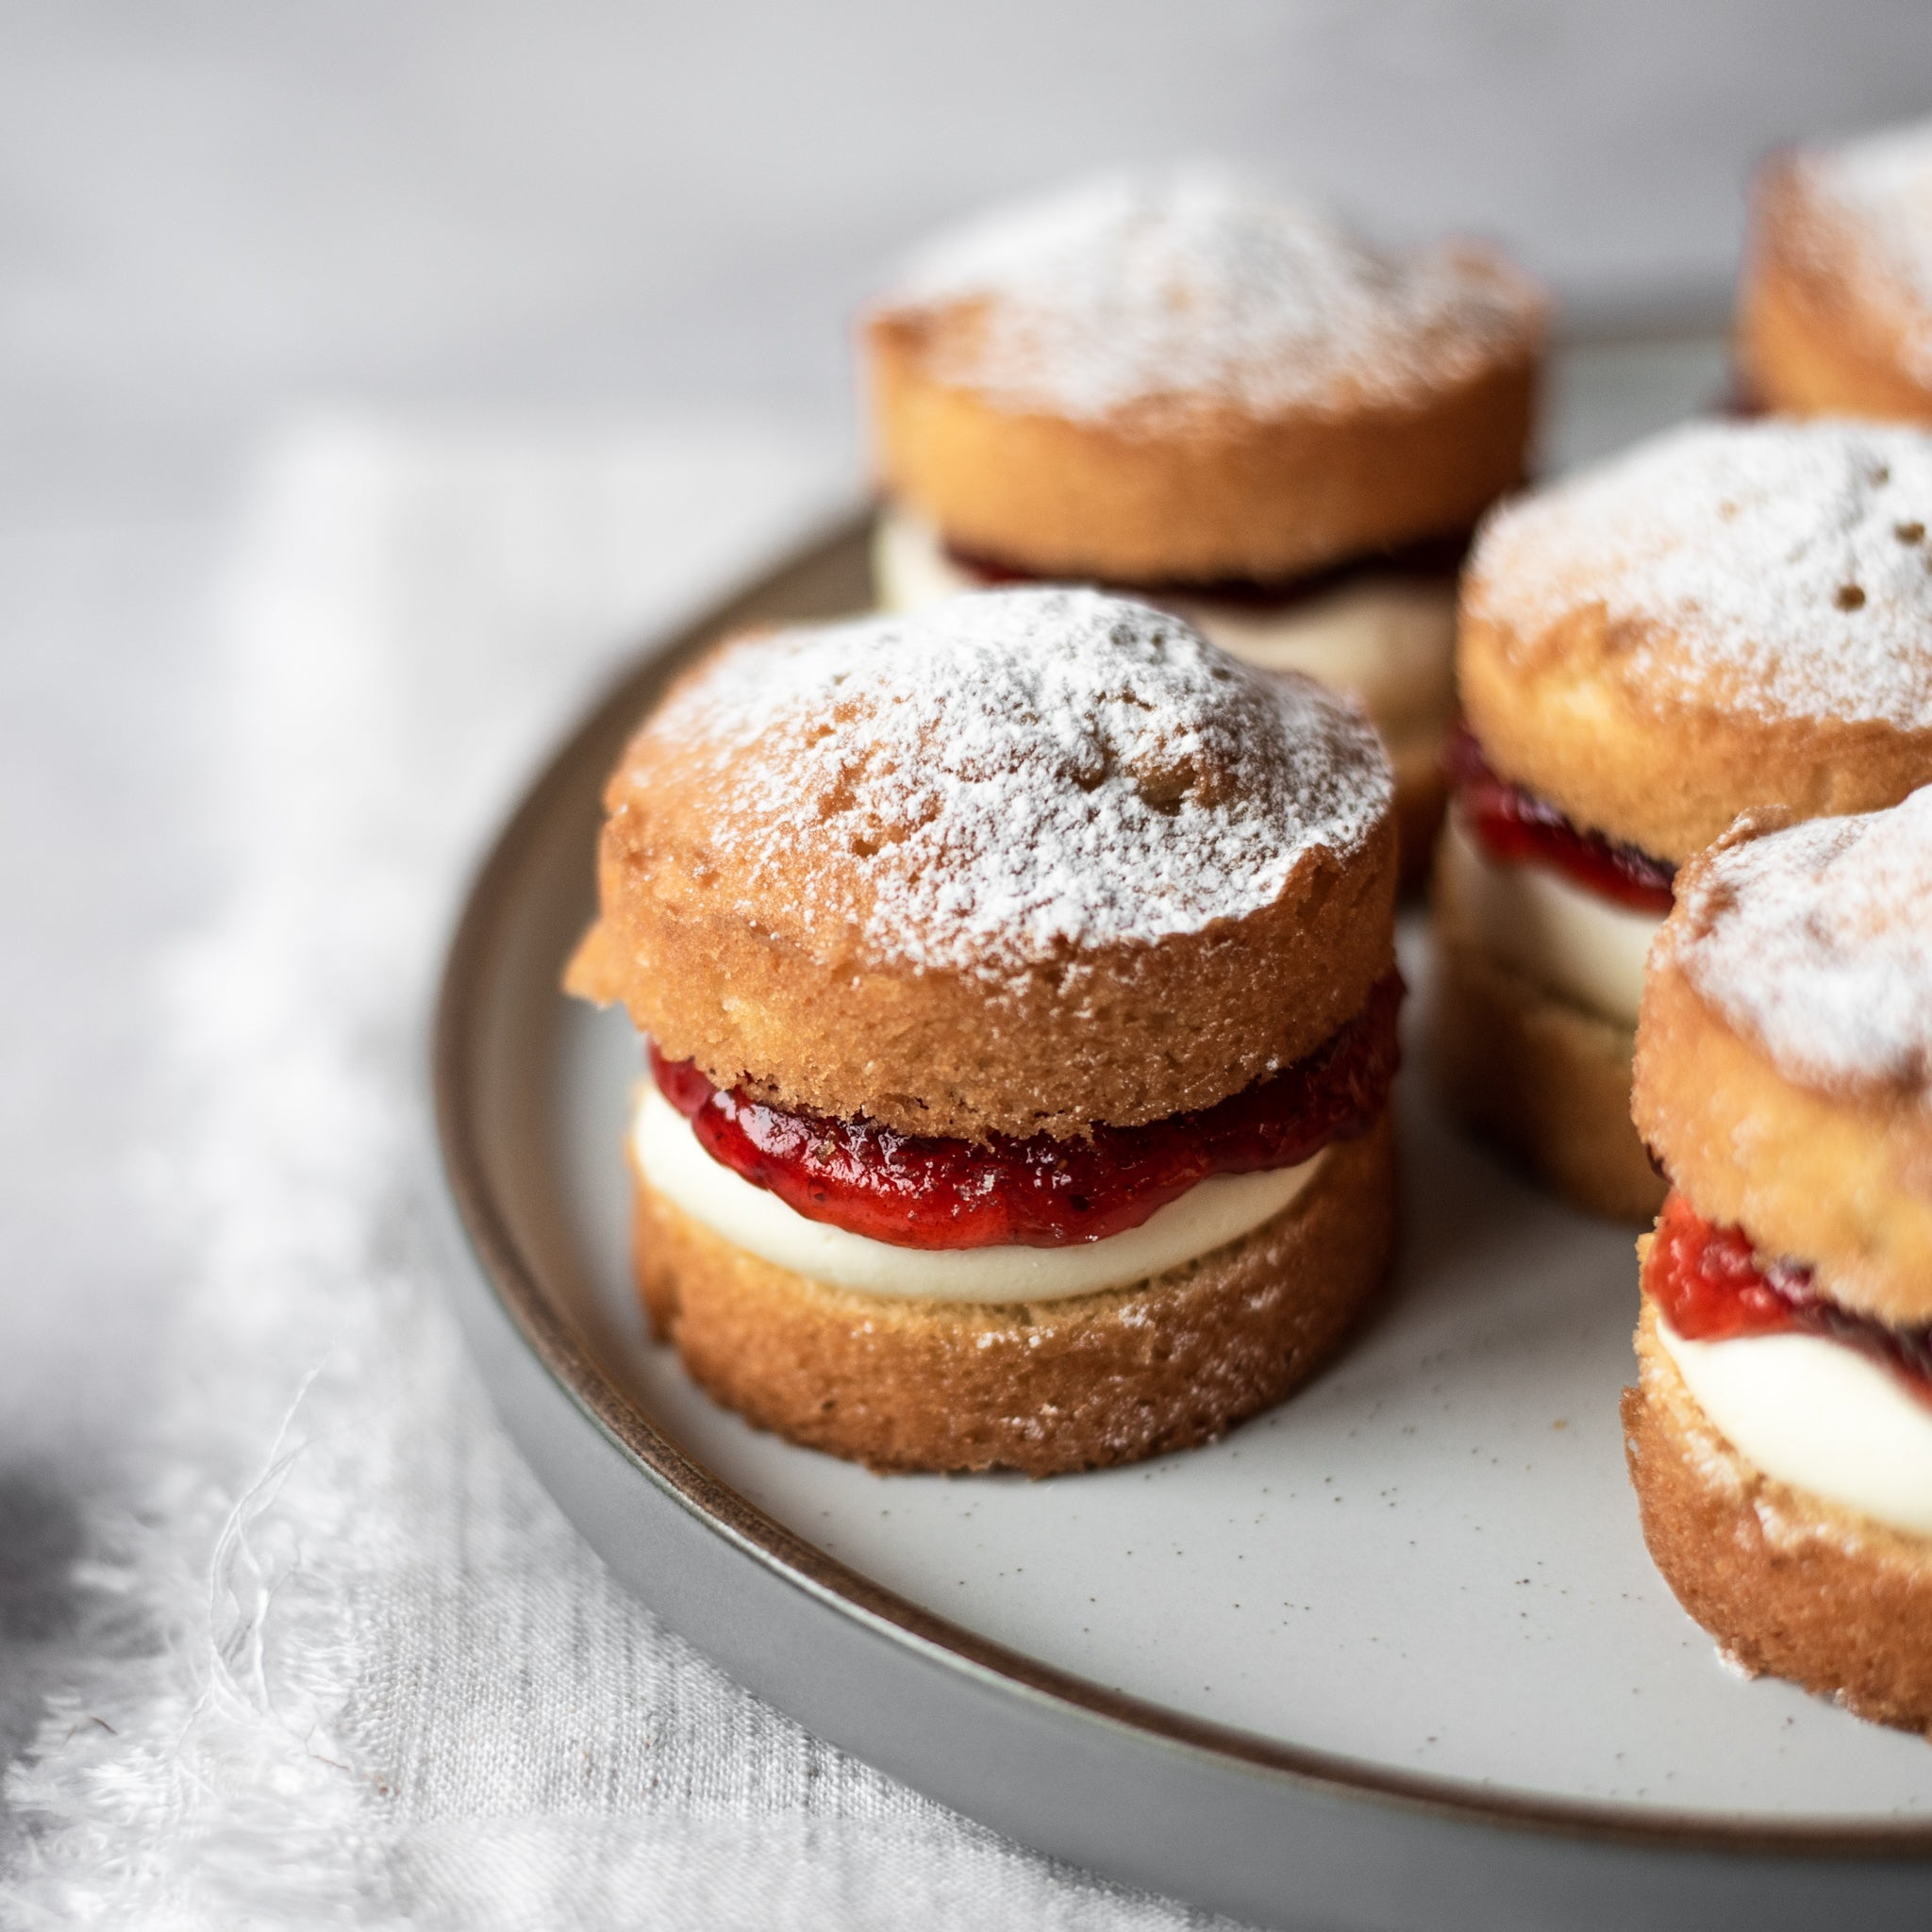 Strawberry-and-Rosewater-Mini-Sponge-Cakes-SQUARE-5.jpg